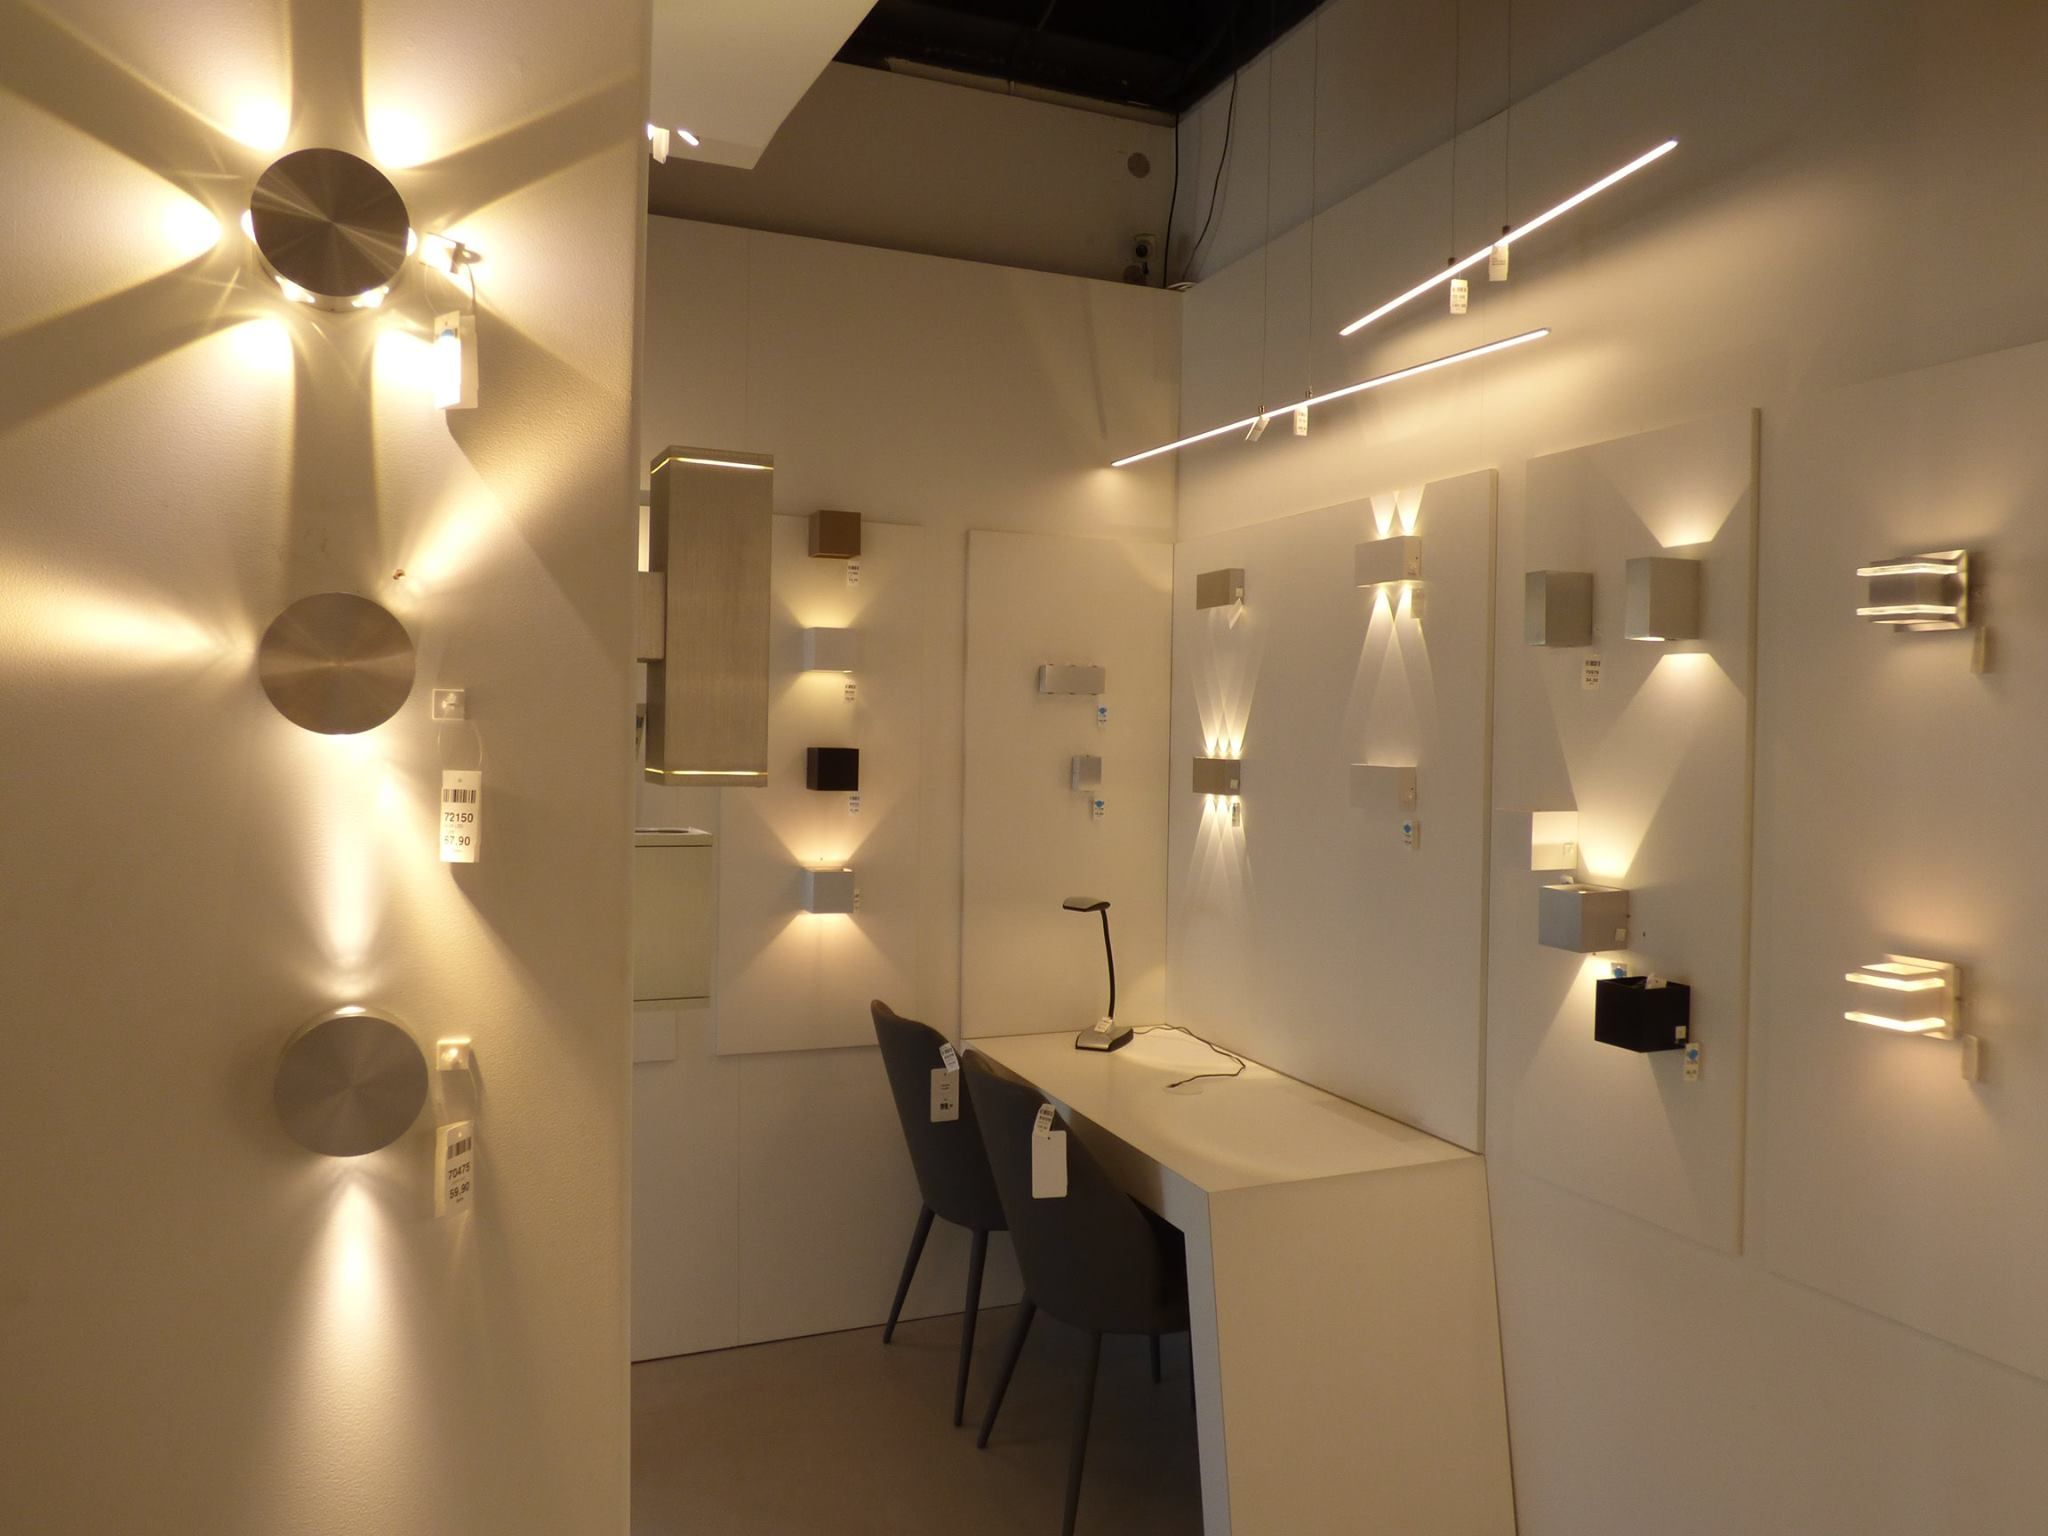 Iluminaci n showroom tienda interior l mparas interior sala dormitorio l mparas led - Focos iluminacion interior ...